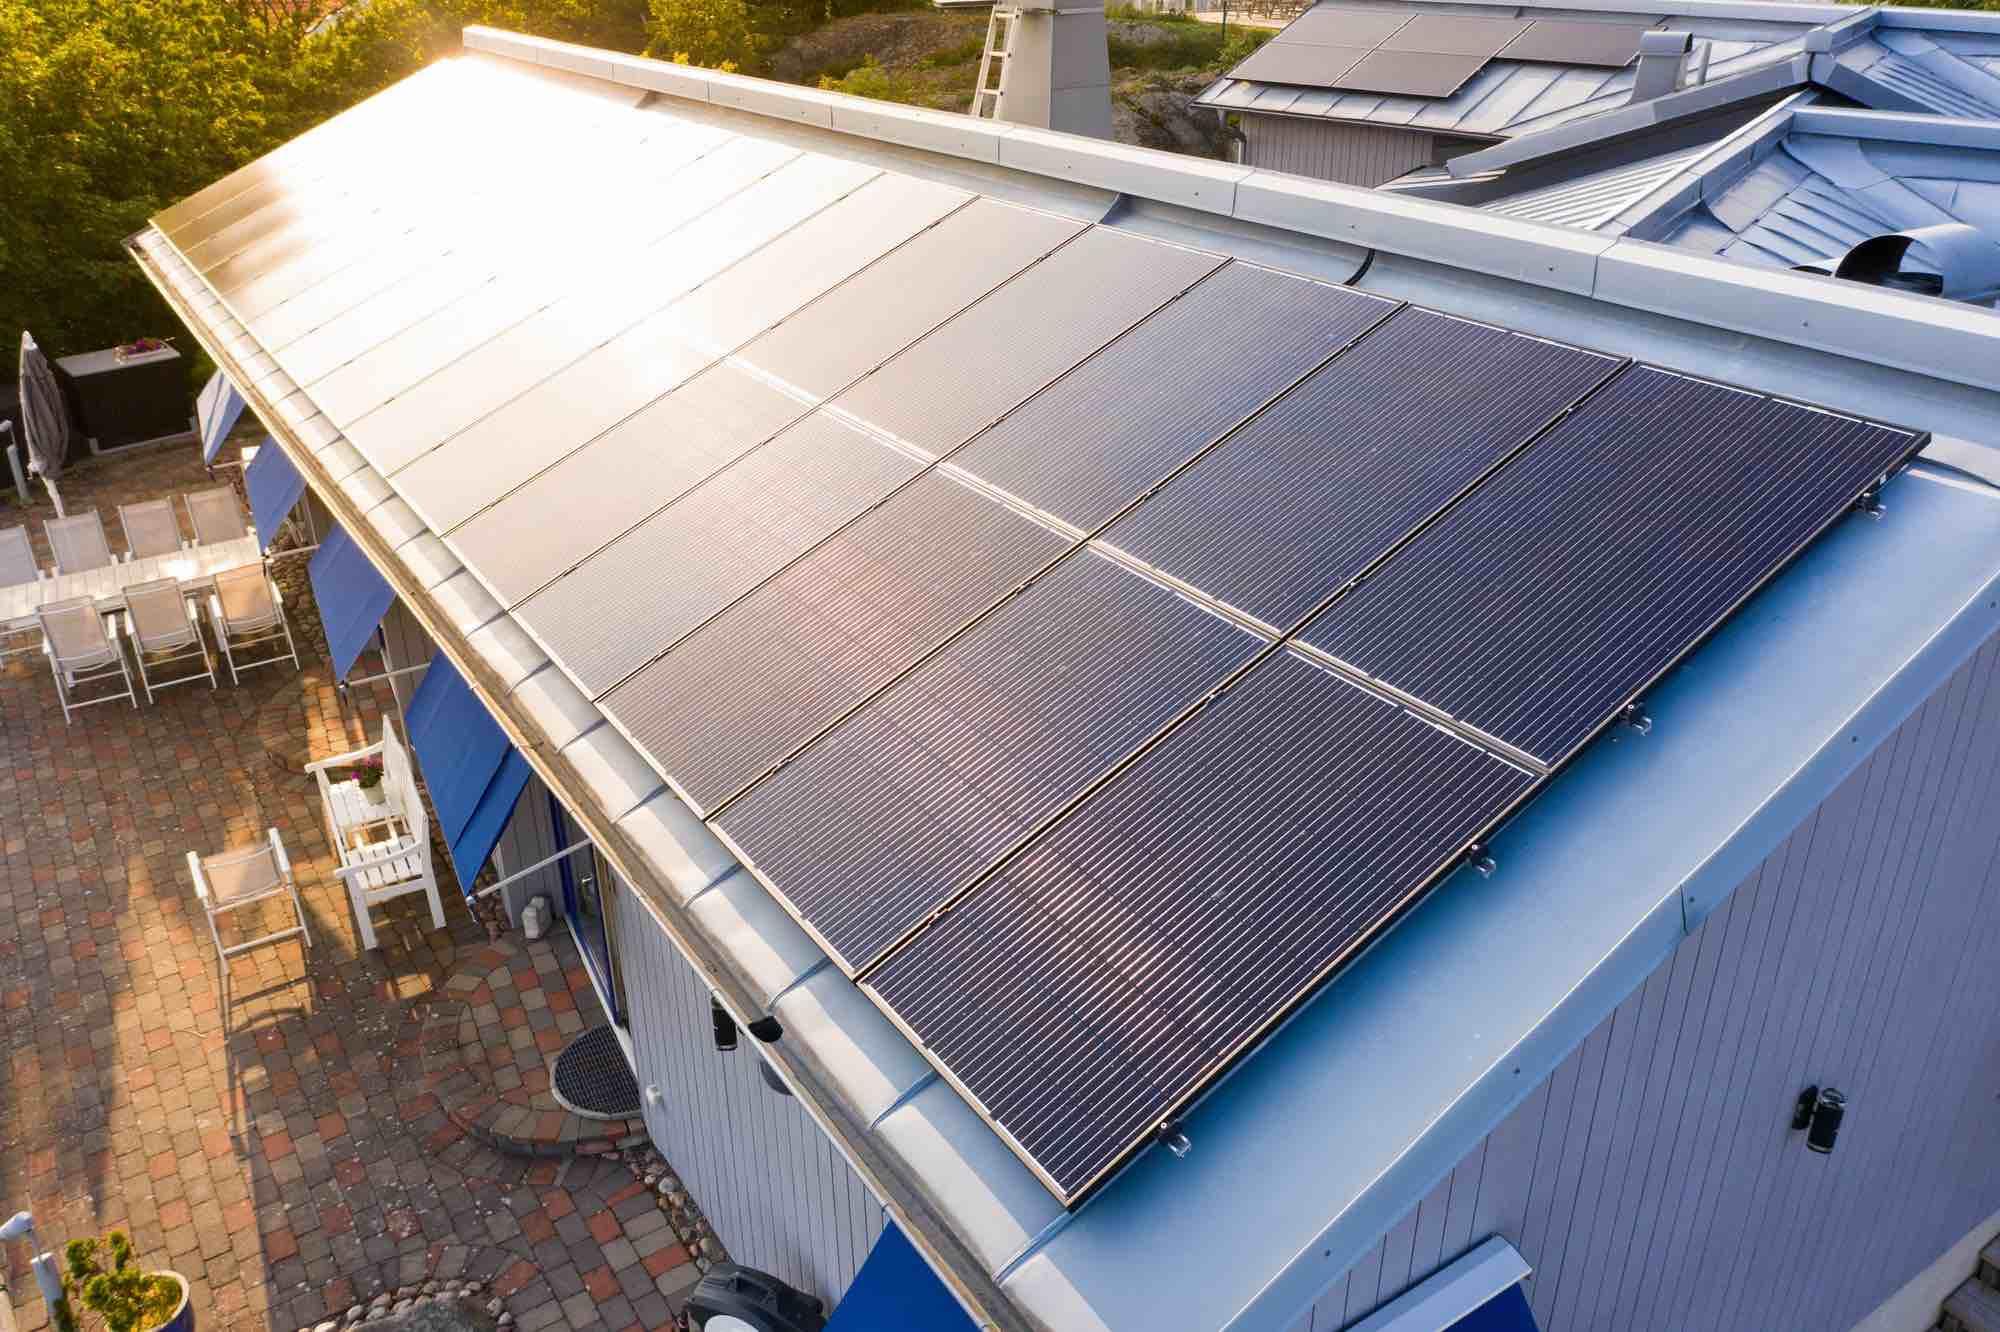 Solceller på tak.